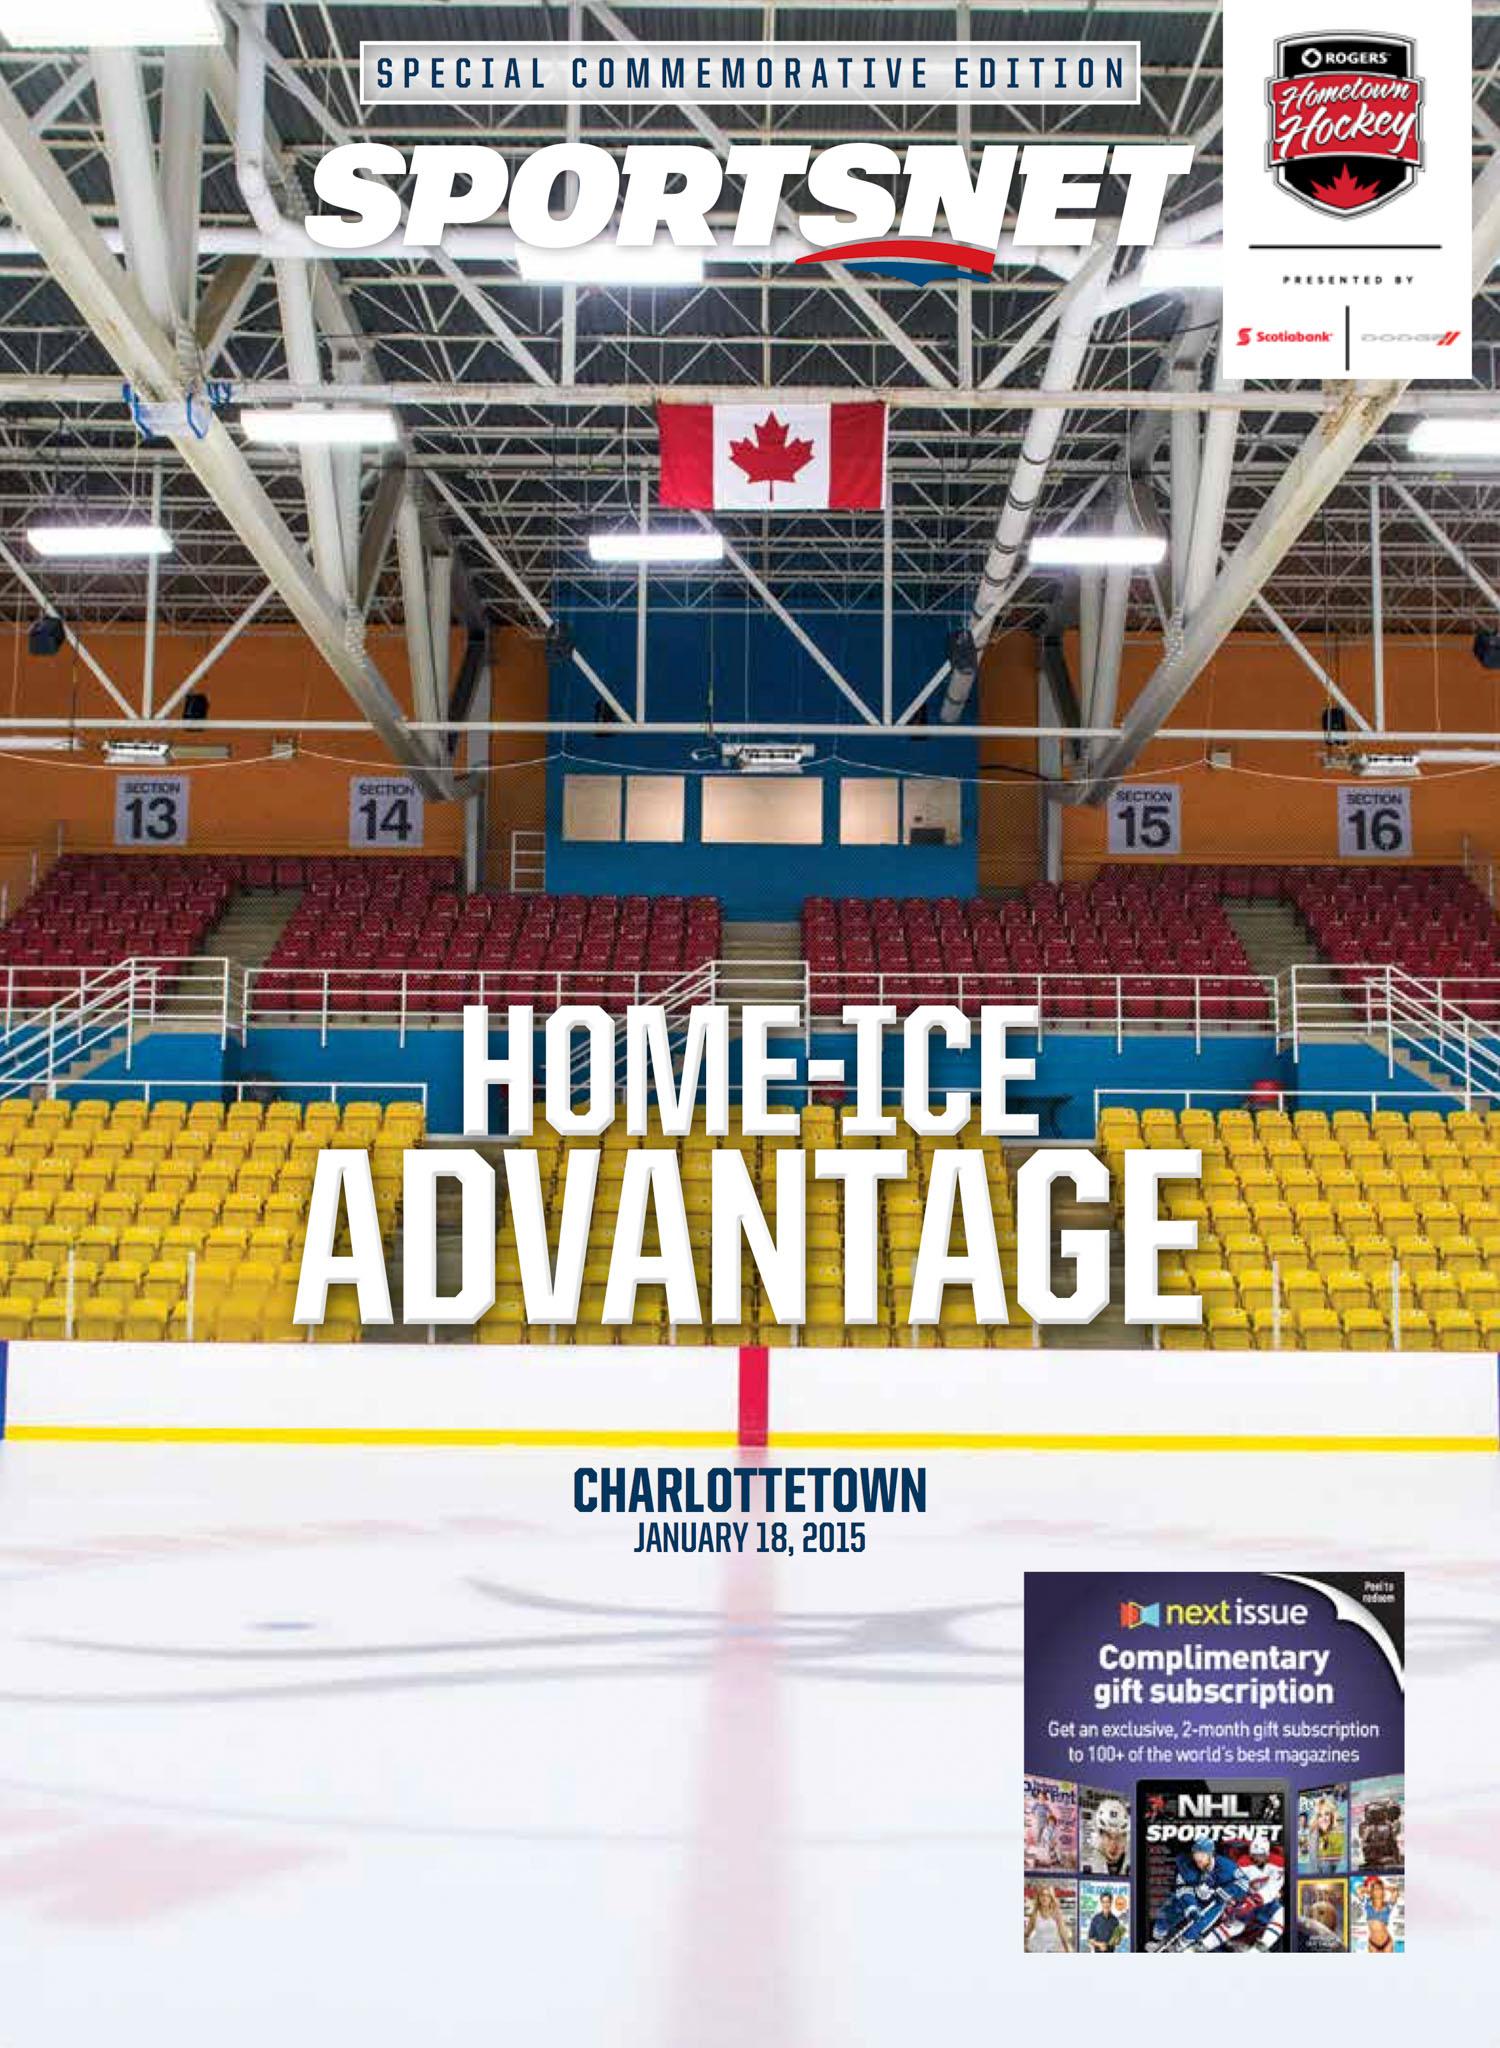 Home-Ice Advantage